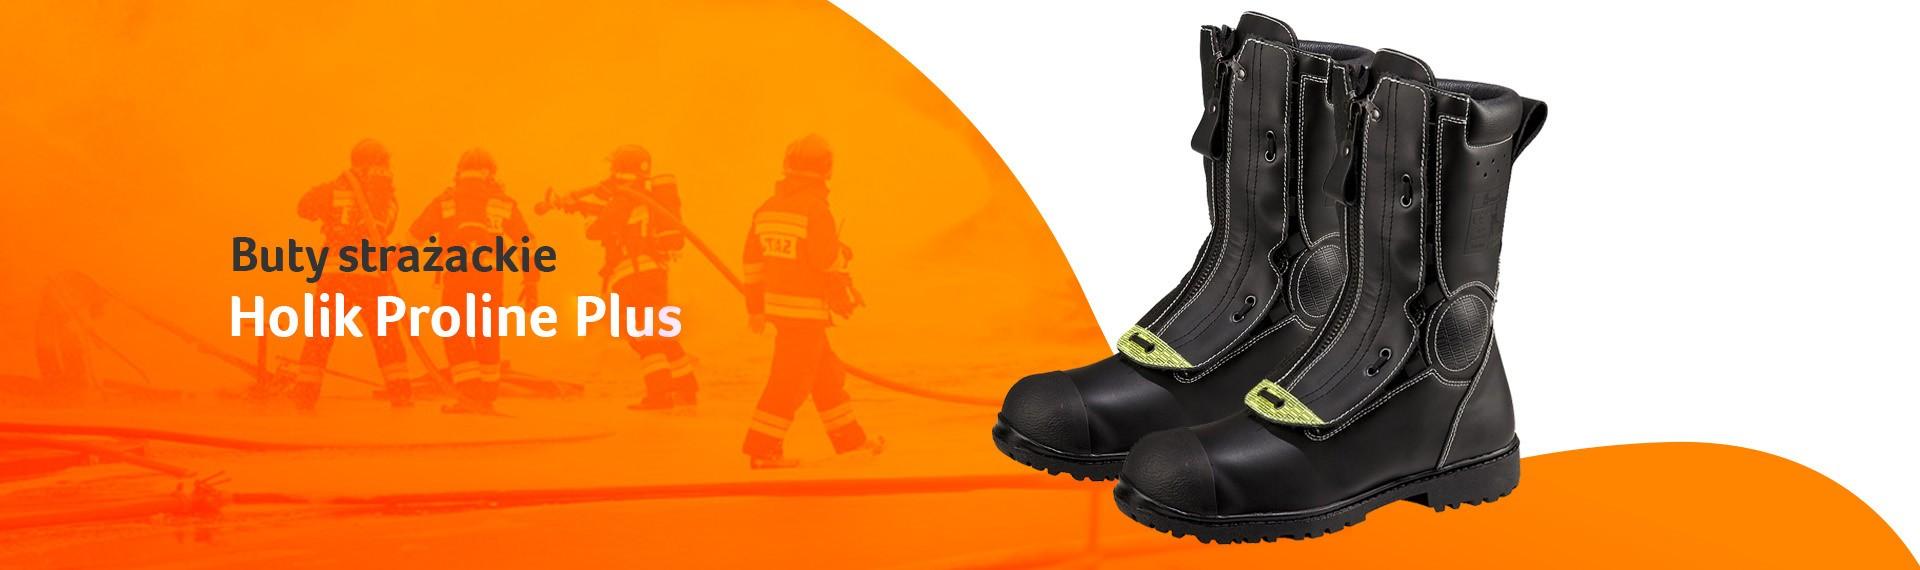 Buty strażackie Holik Proline II Plus